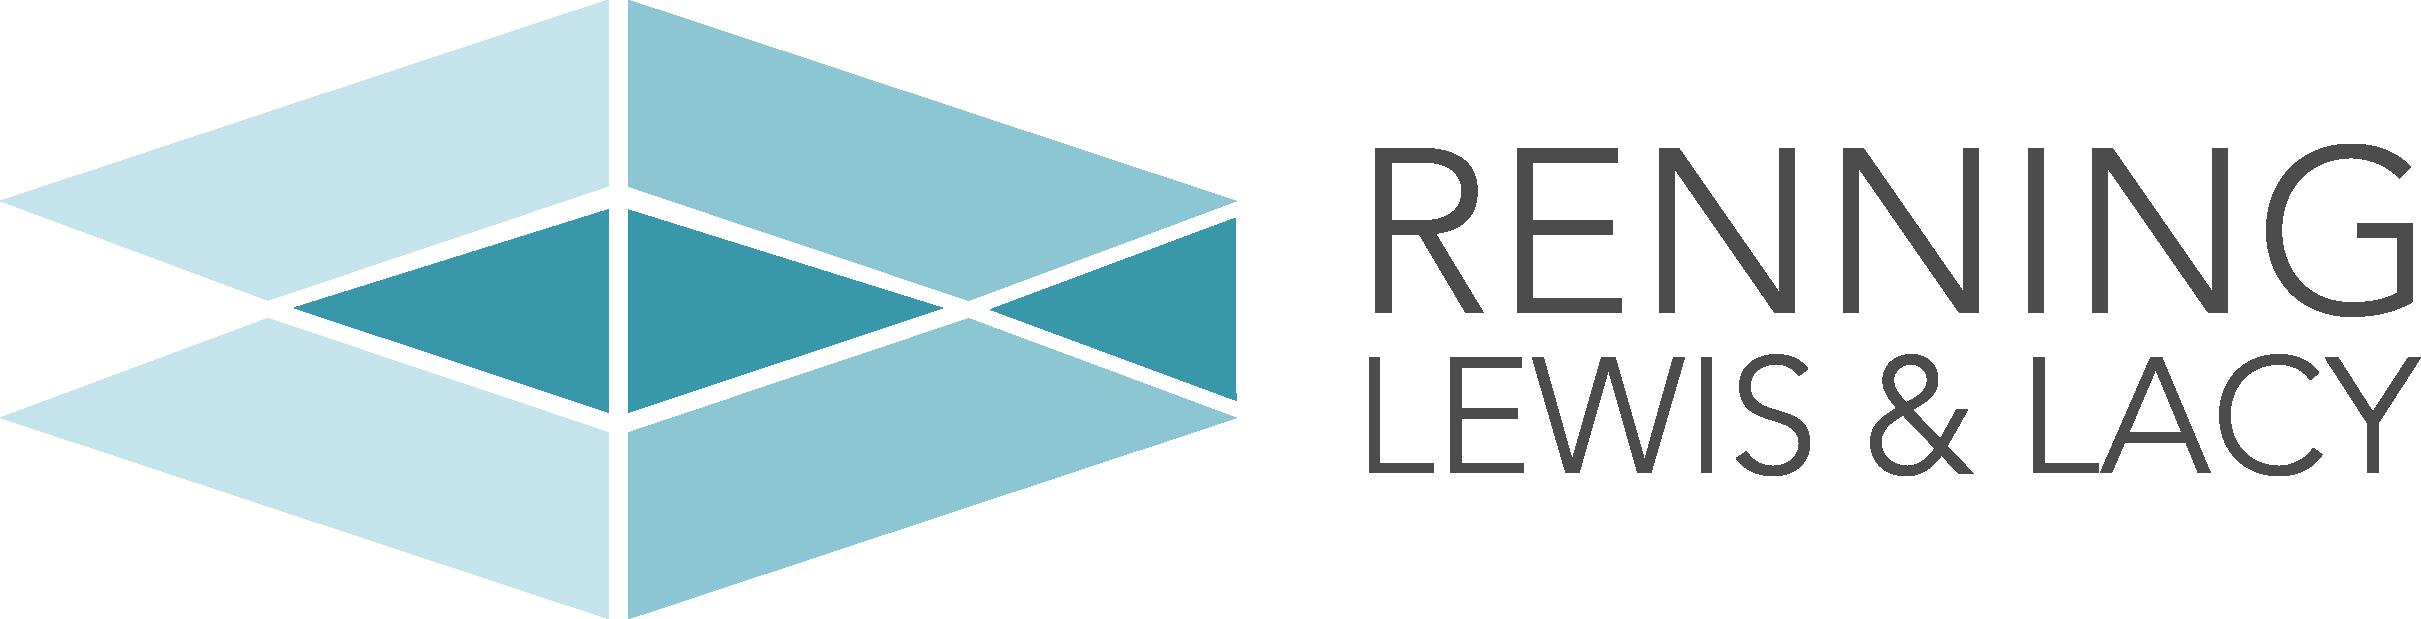 Renning Lewis Lacy